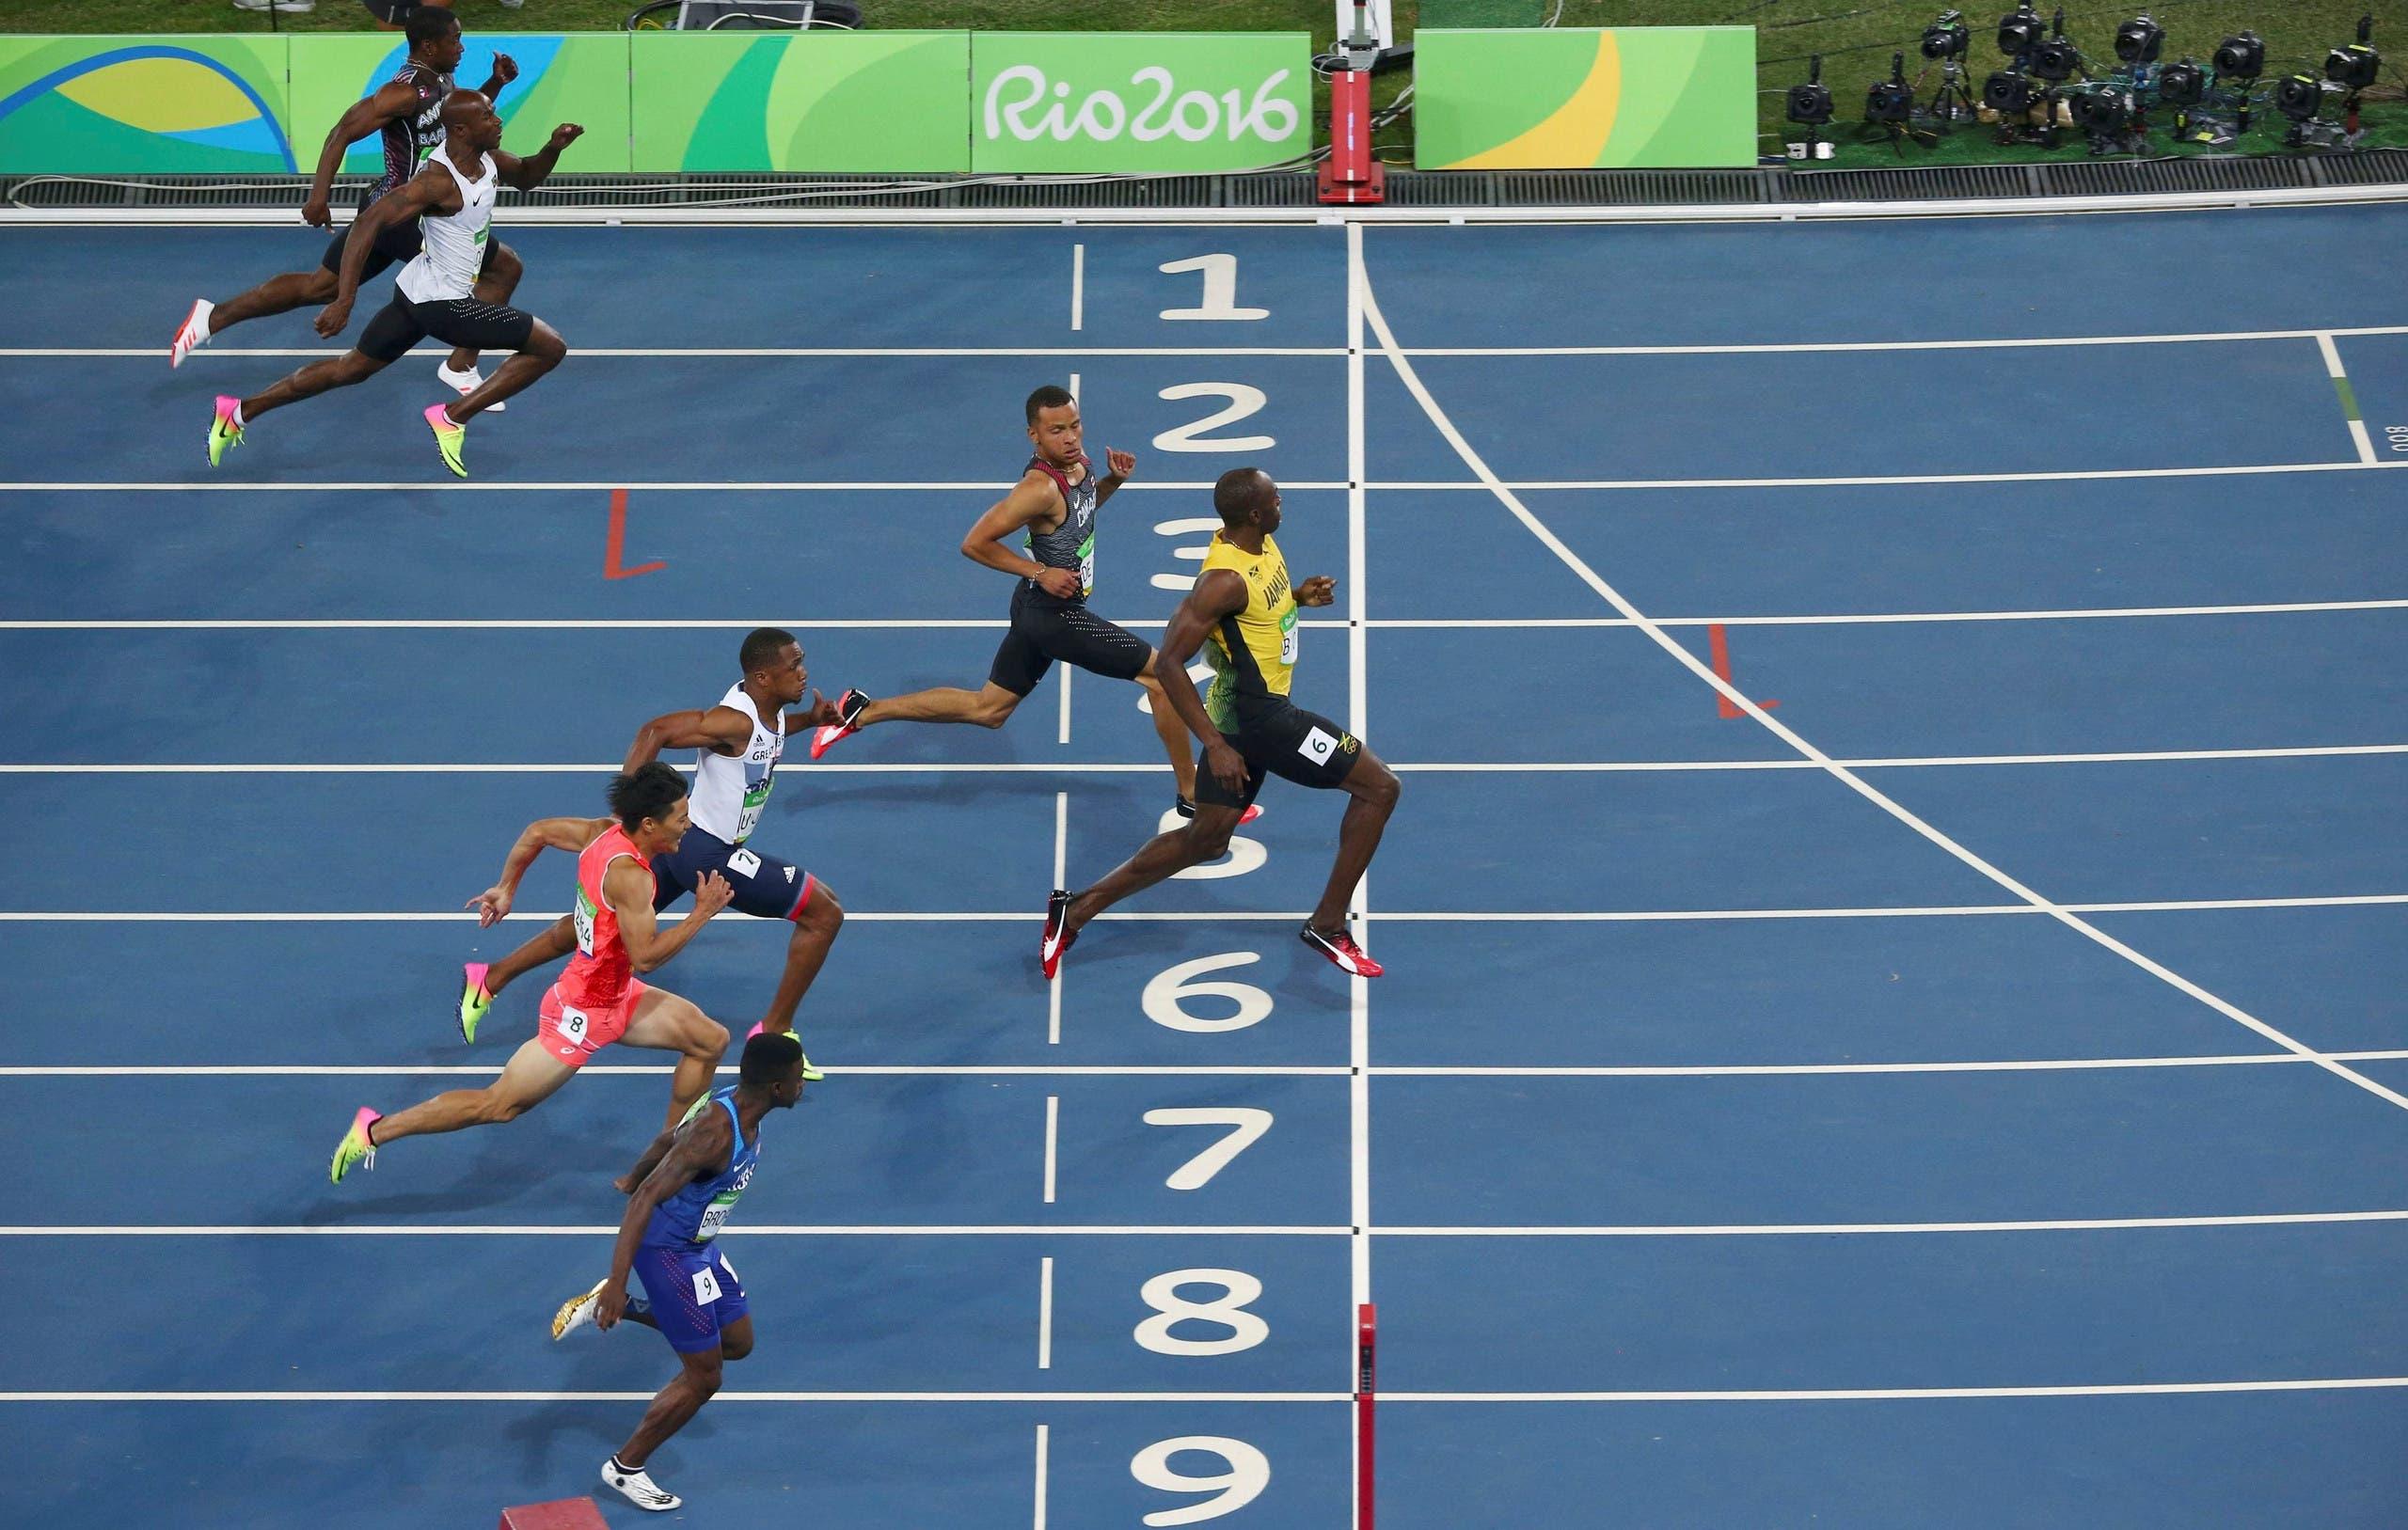 Usain Bolt (JAM) of Jamaica crosses the finish line. REUTERS